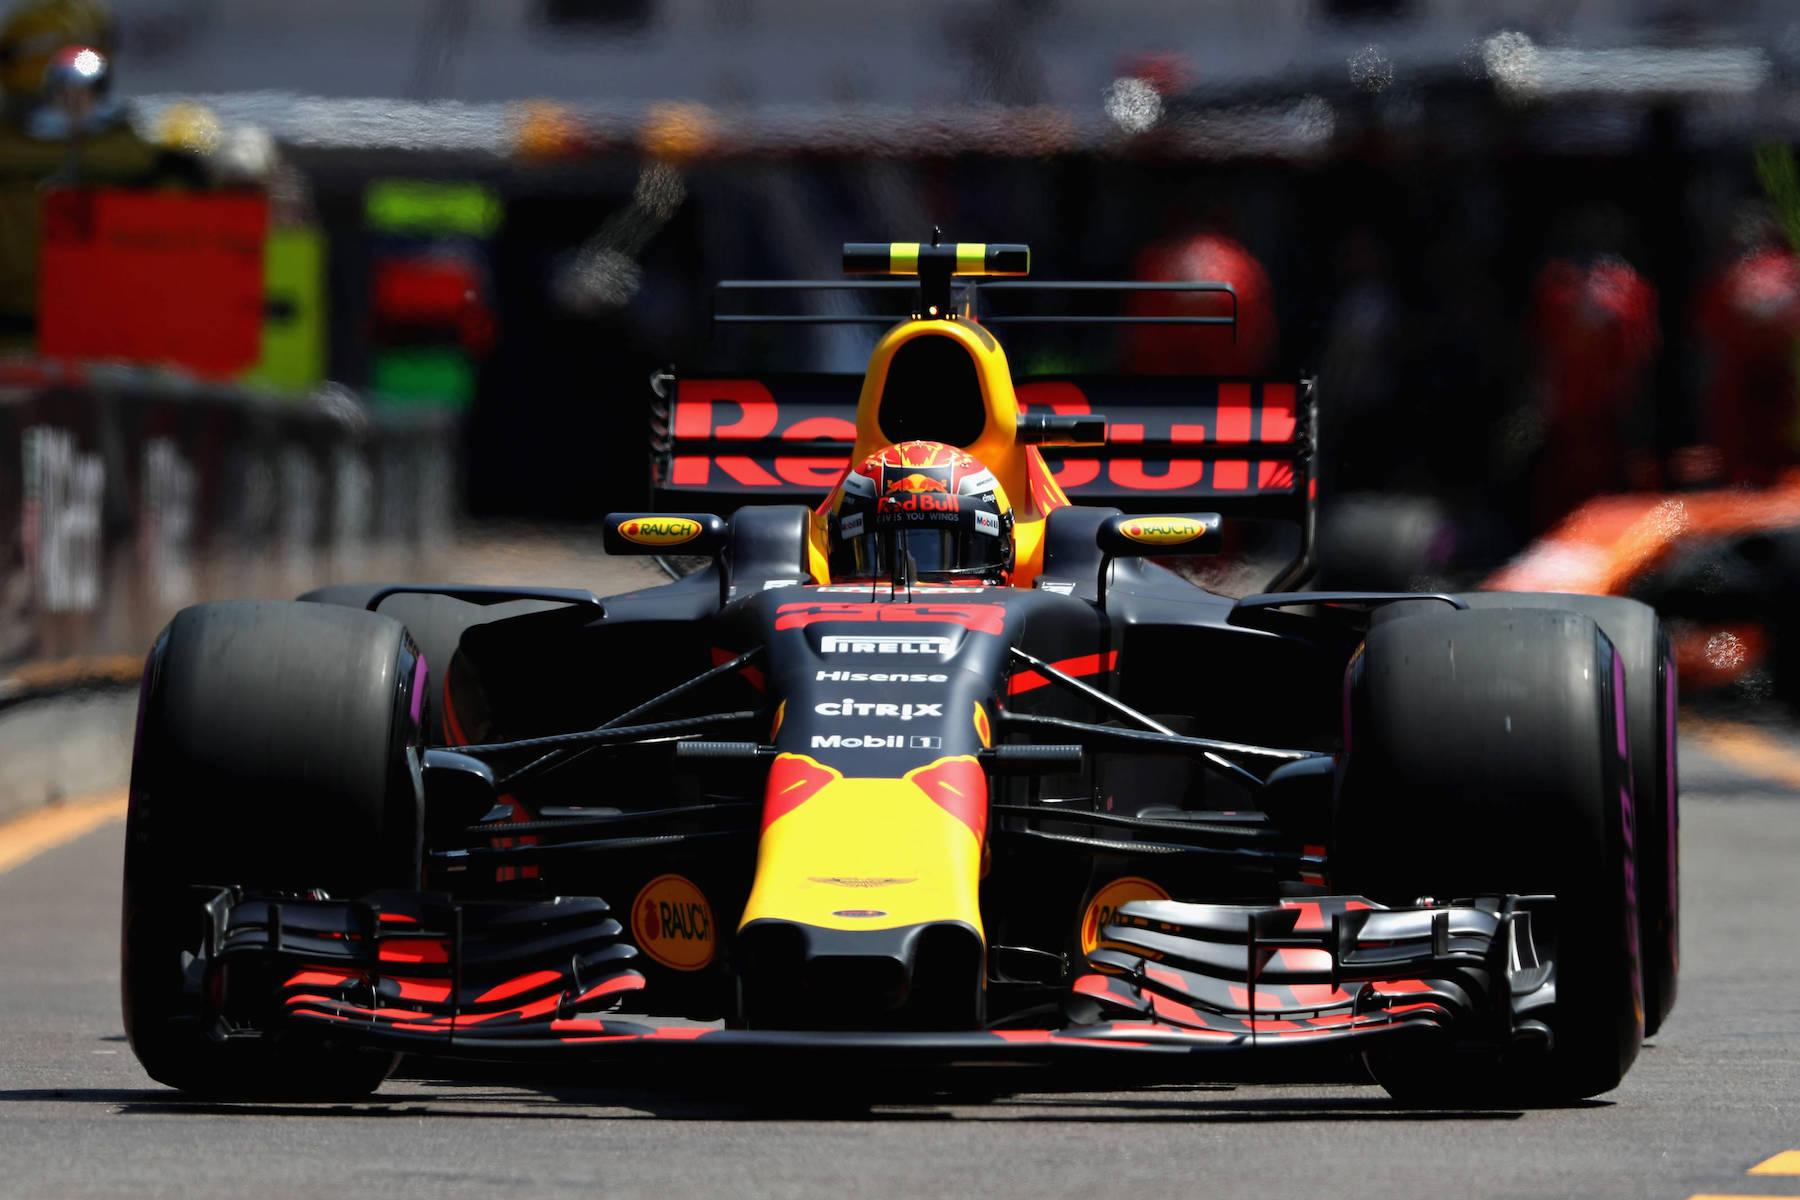 2017 Max Verstappen | Red Bull RB13 | 2017 Monaco GP Q3 1 copy.jpg